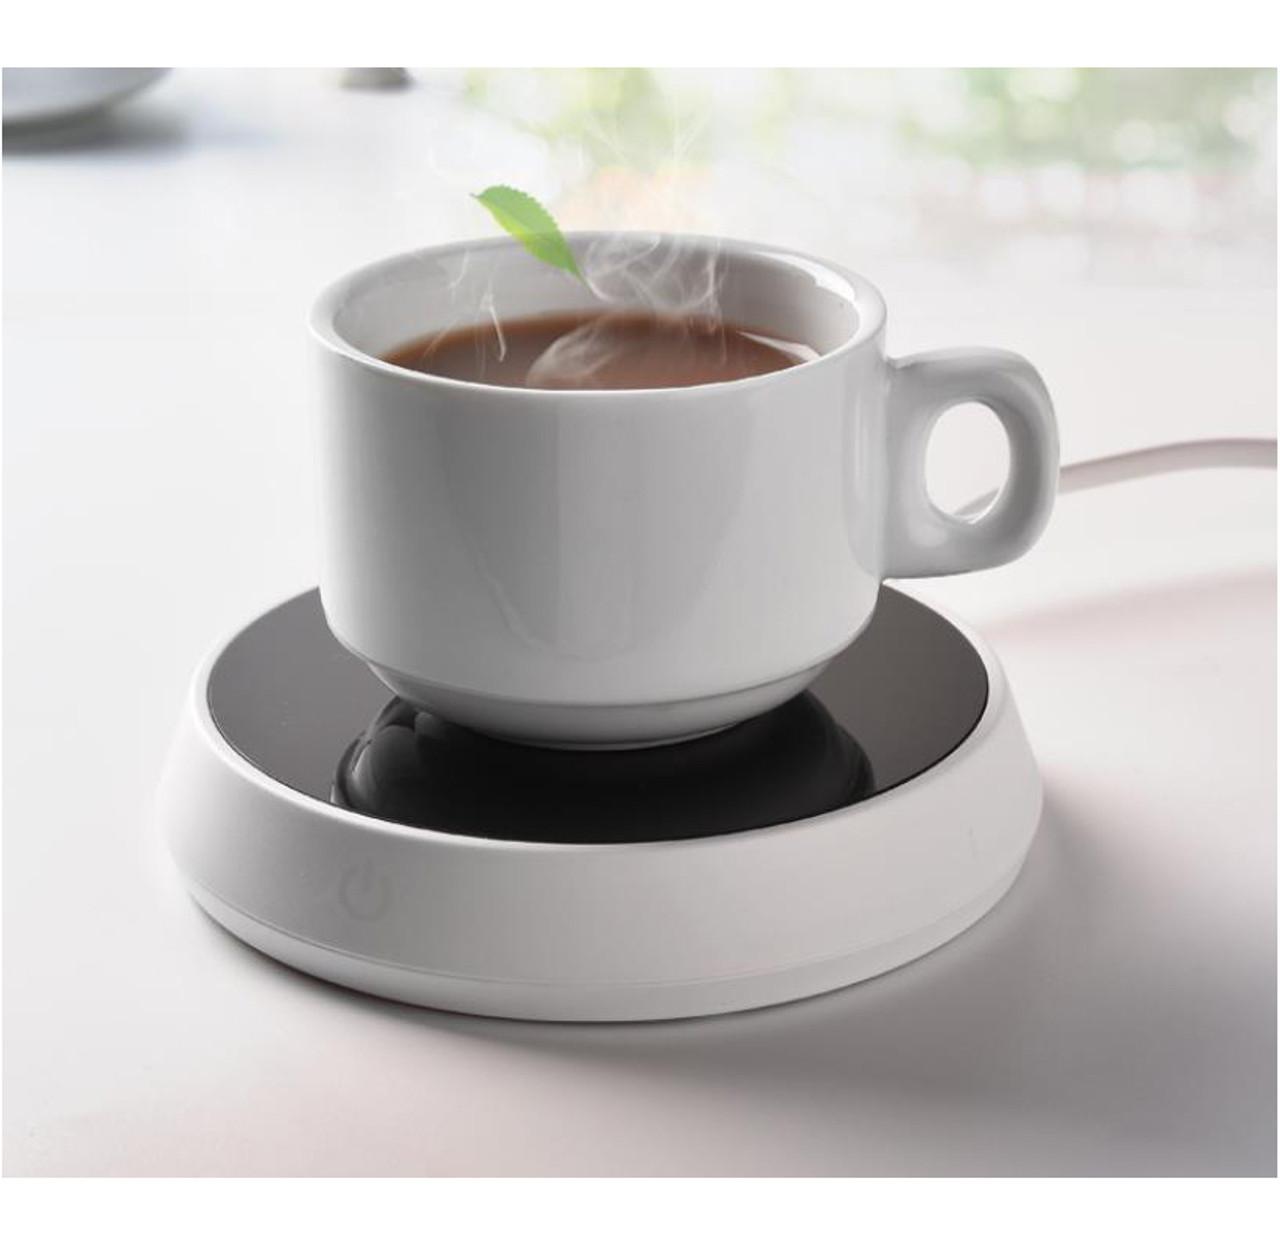 Electric Heated Mug Warmer with Auto Shut Off! .99 (REG .99) at Until Gone!